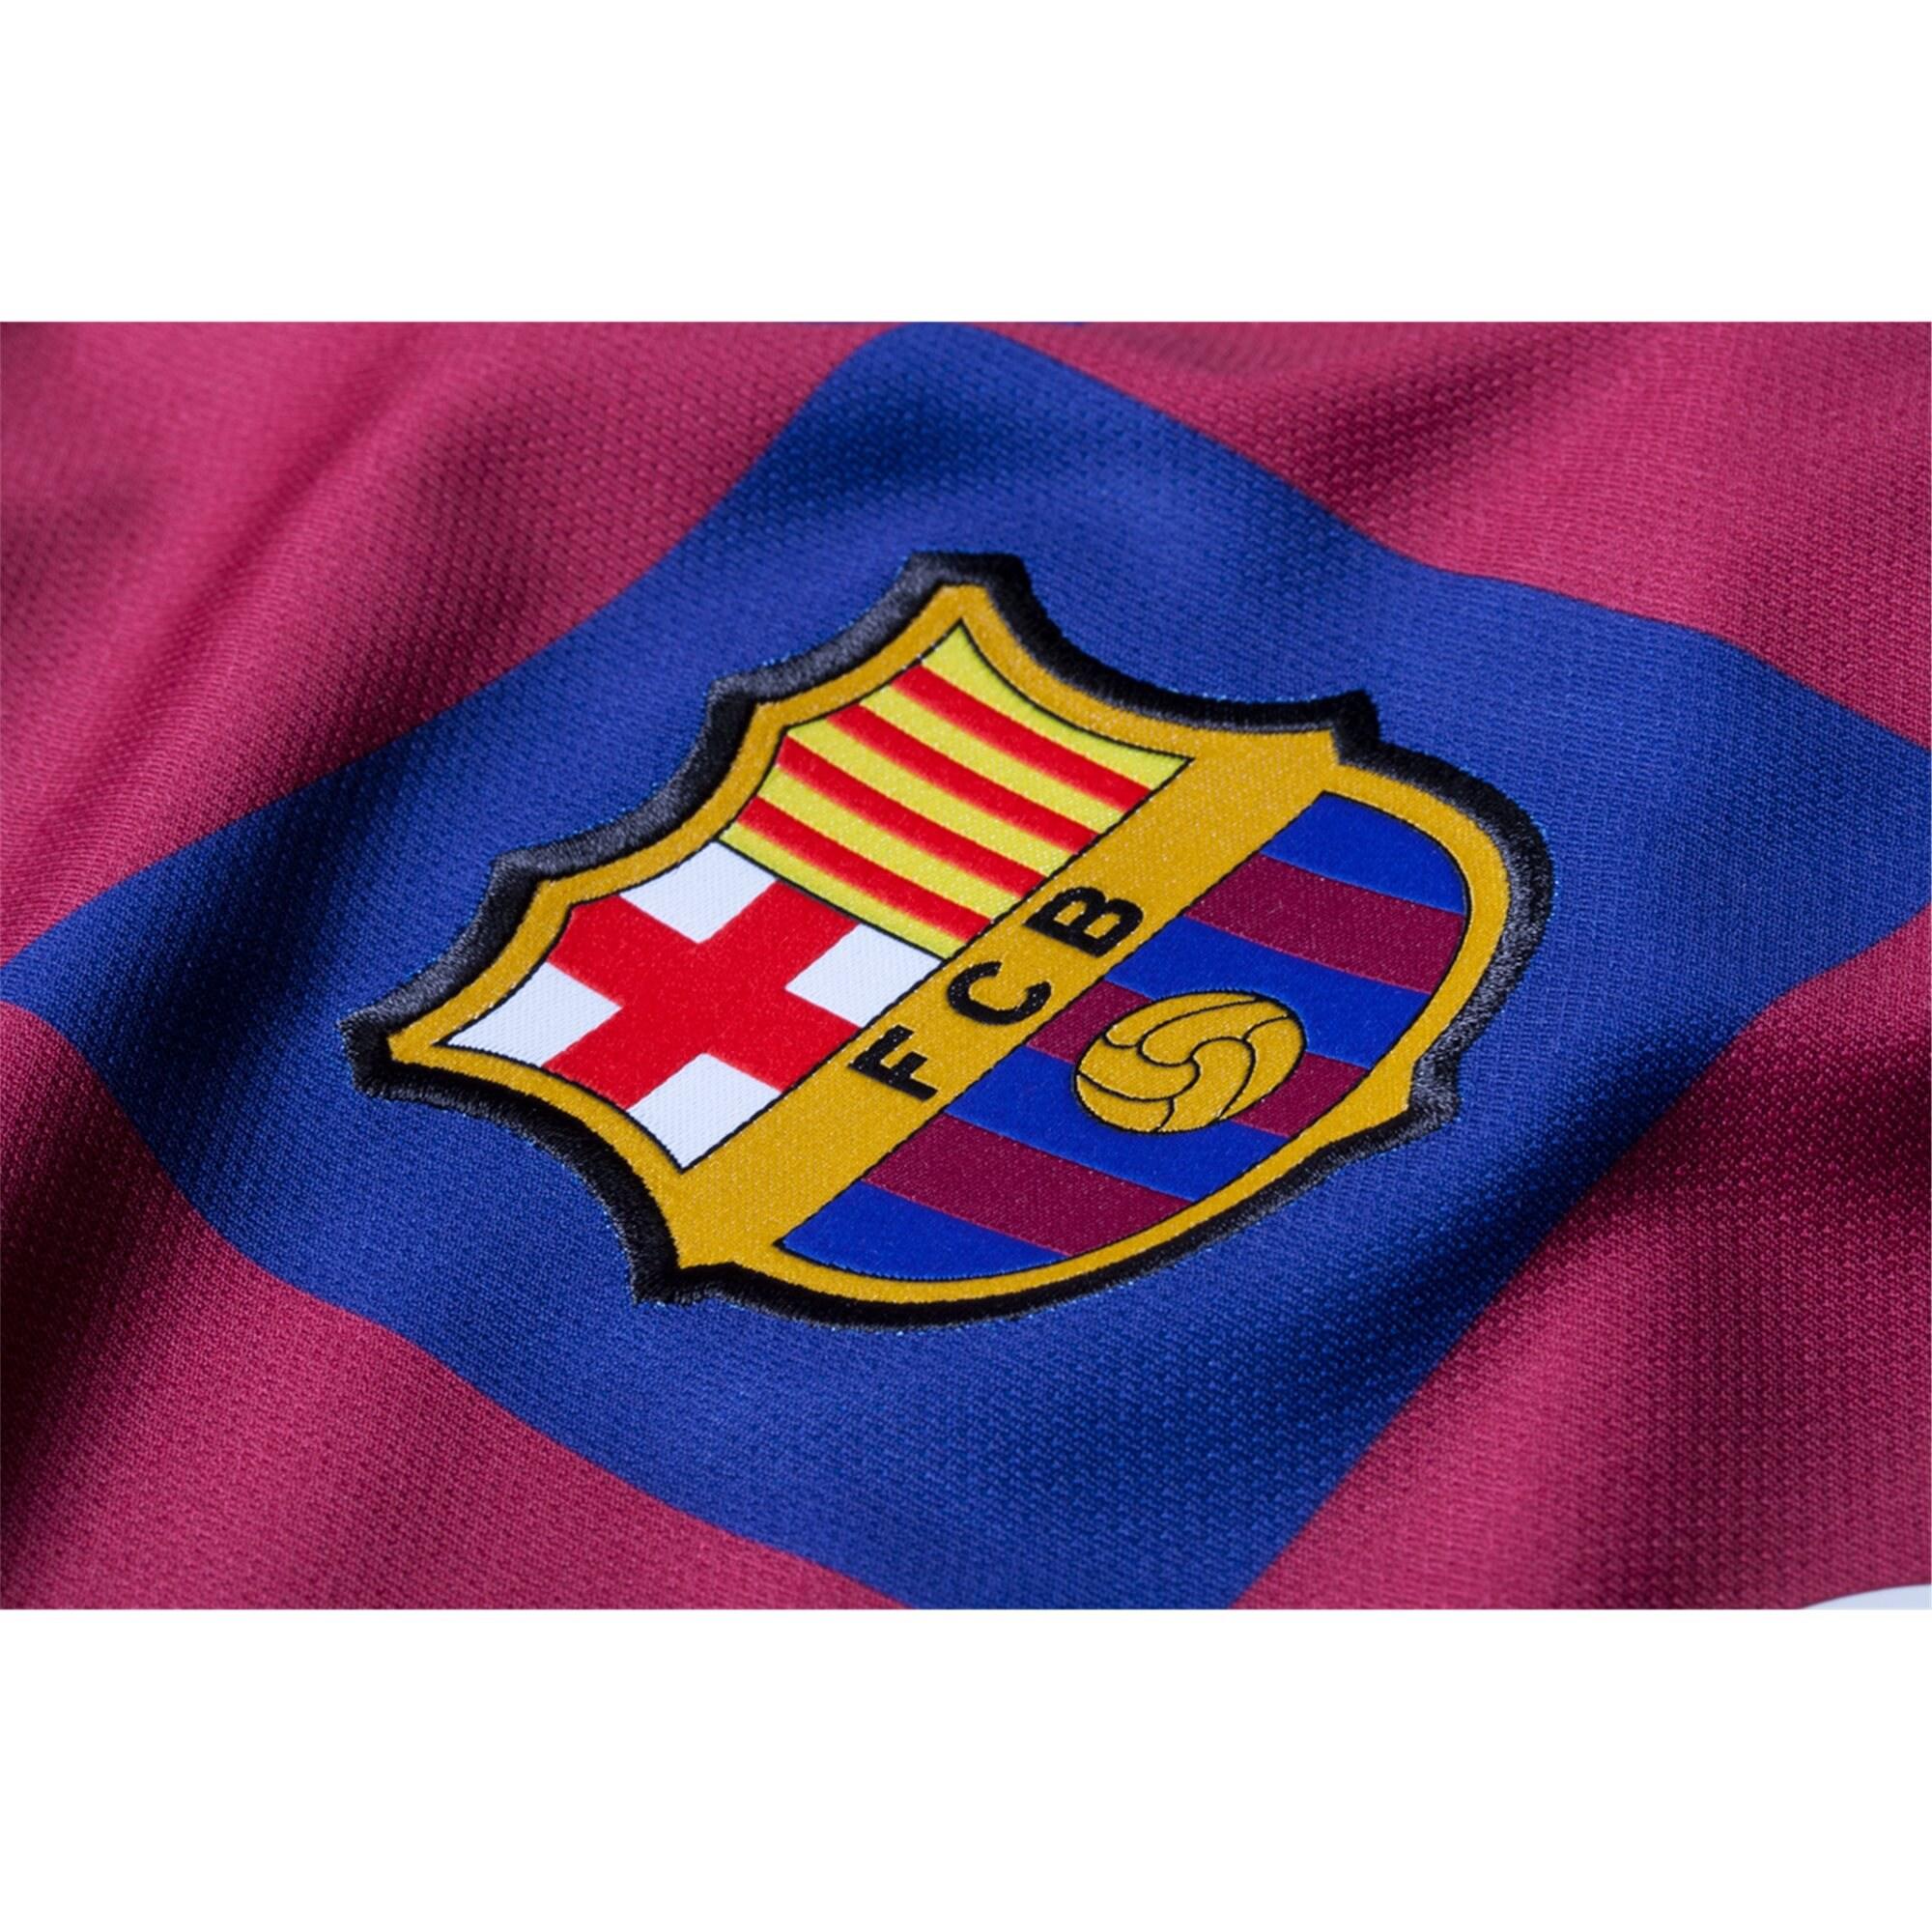 Barcelona Home Jersey 2019 Replica